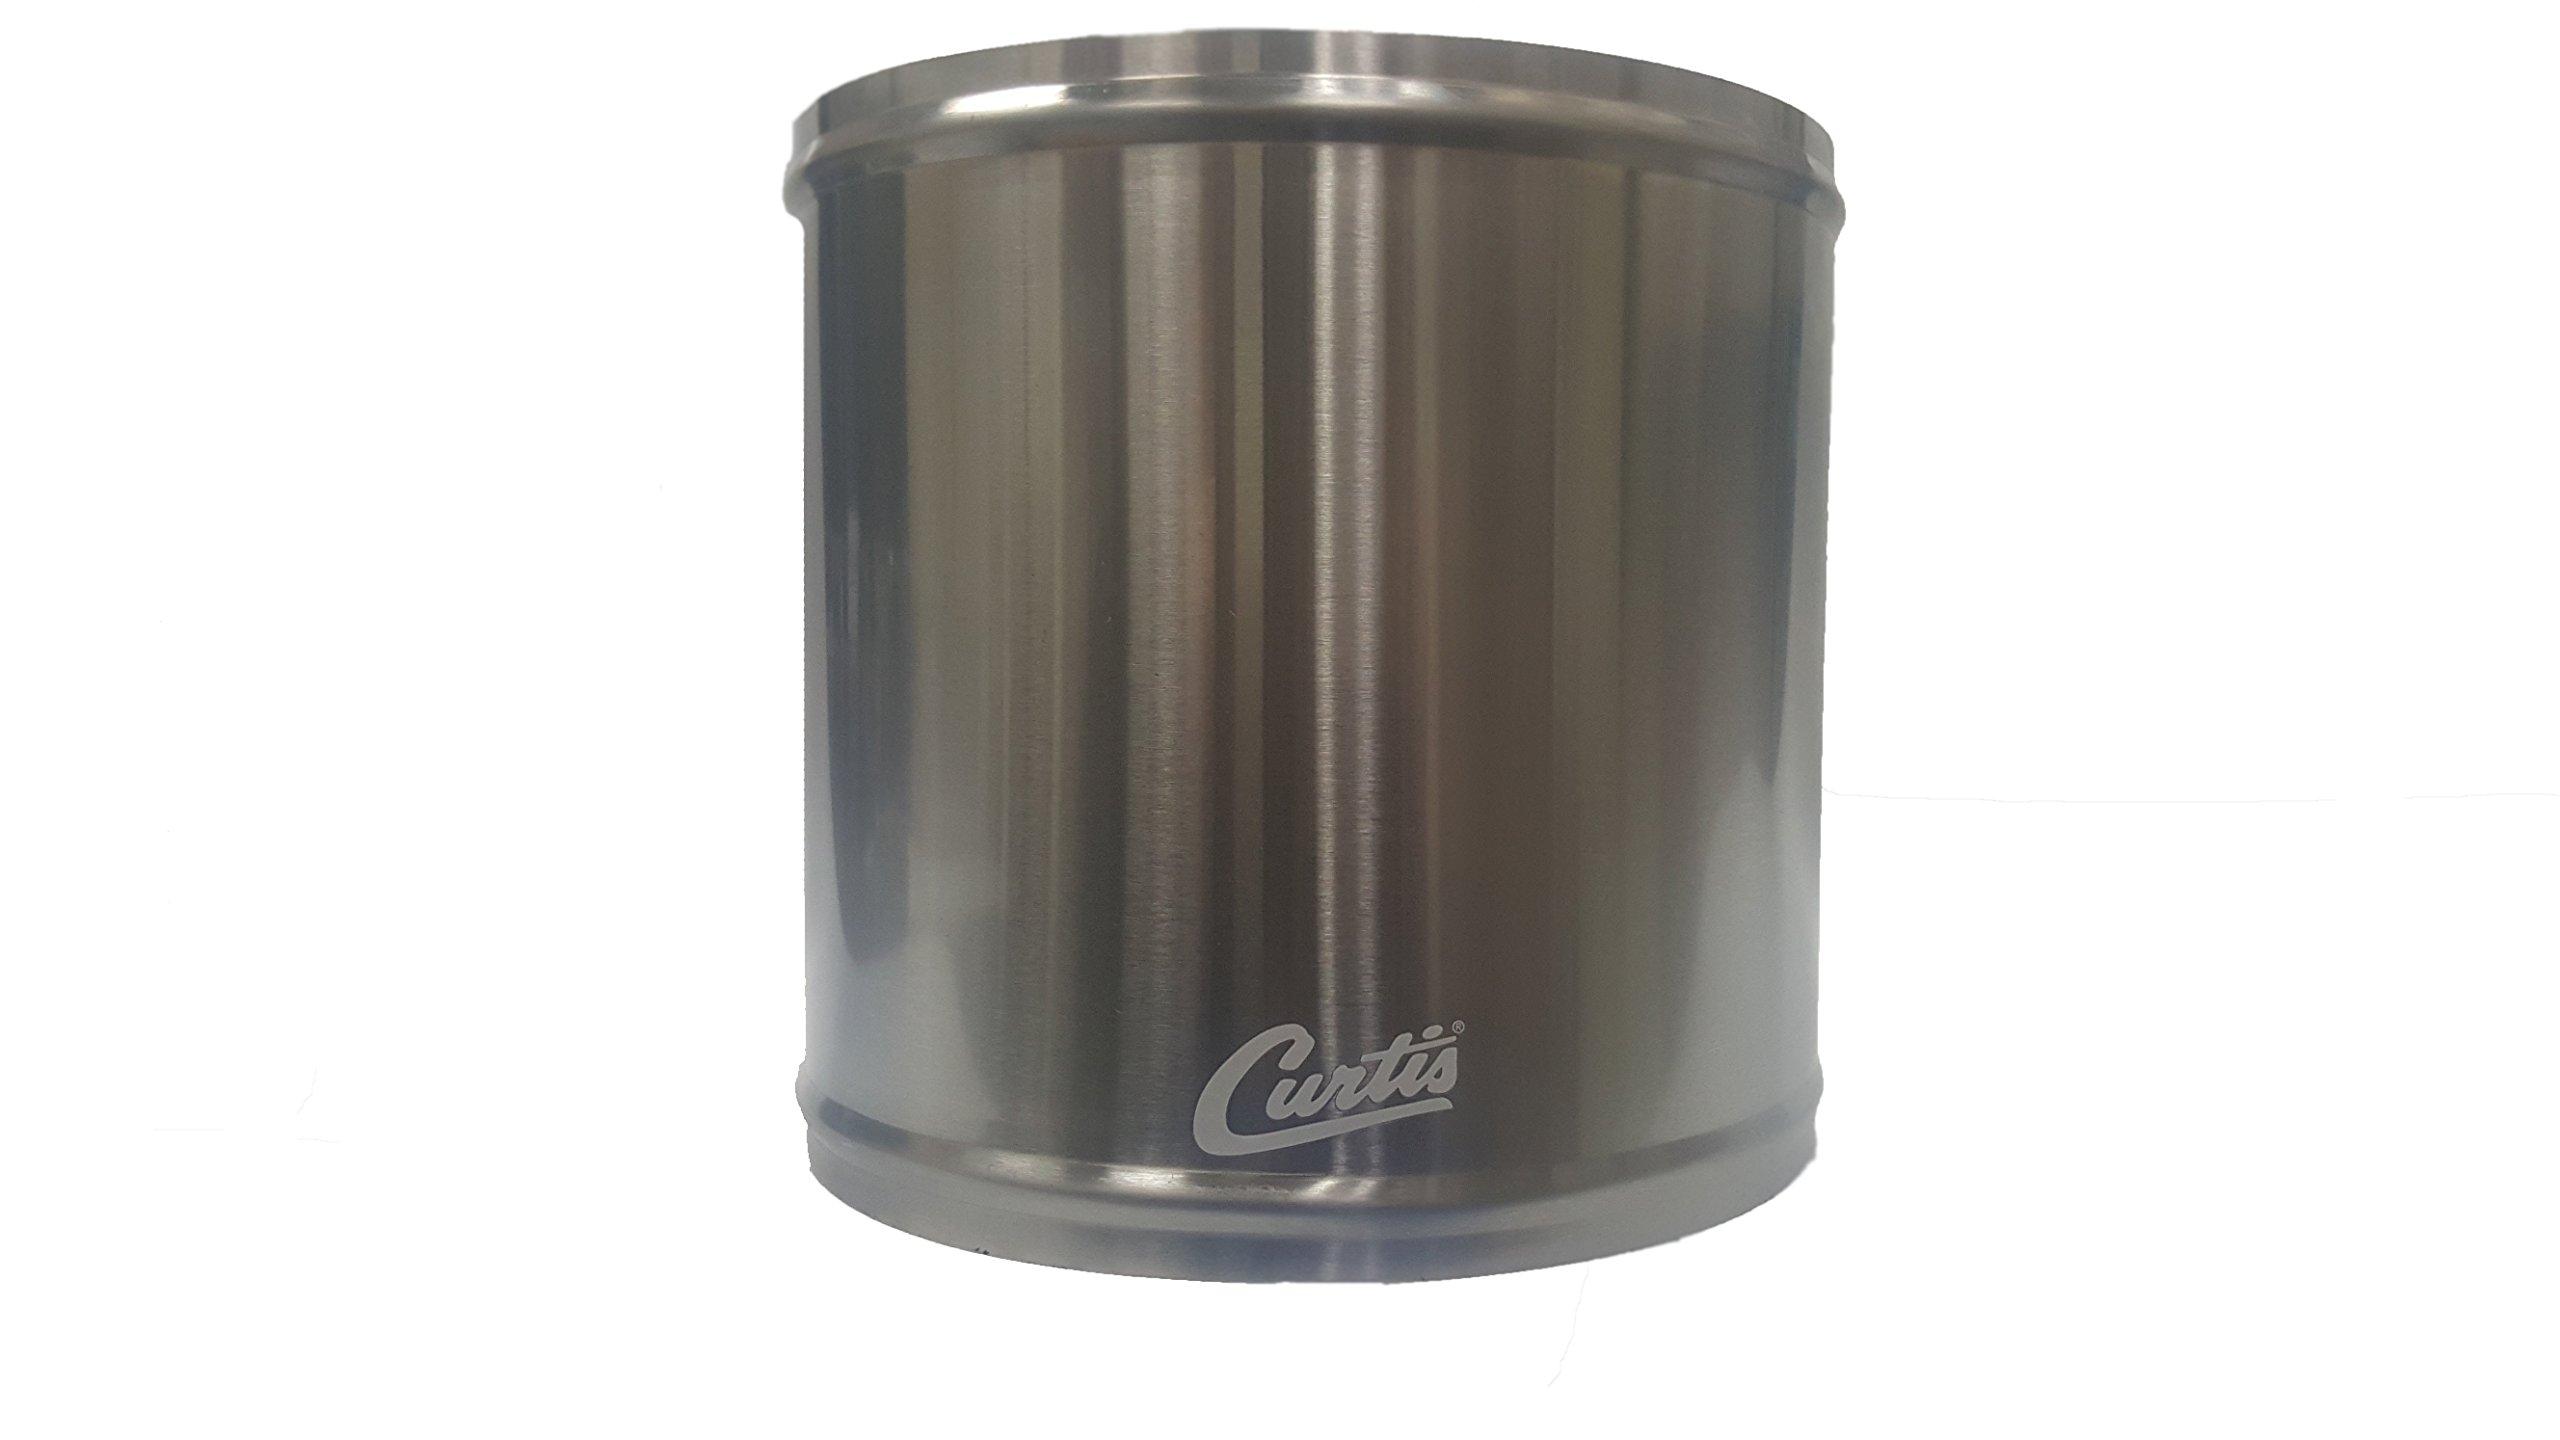 Wilbur Curtis Iced Tea Dispenser Remote Tea Dispenser Stand, Stackable - Designed to Preserve Flavor - TC15RS (Each) by Wilbur Curtis